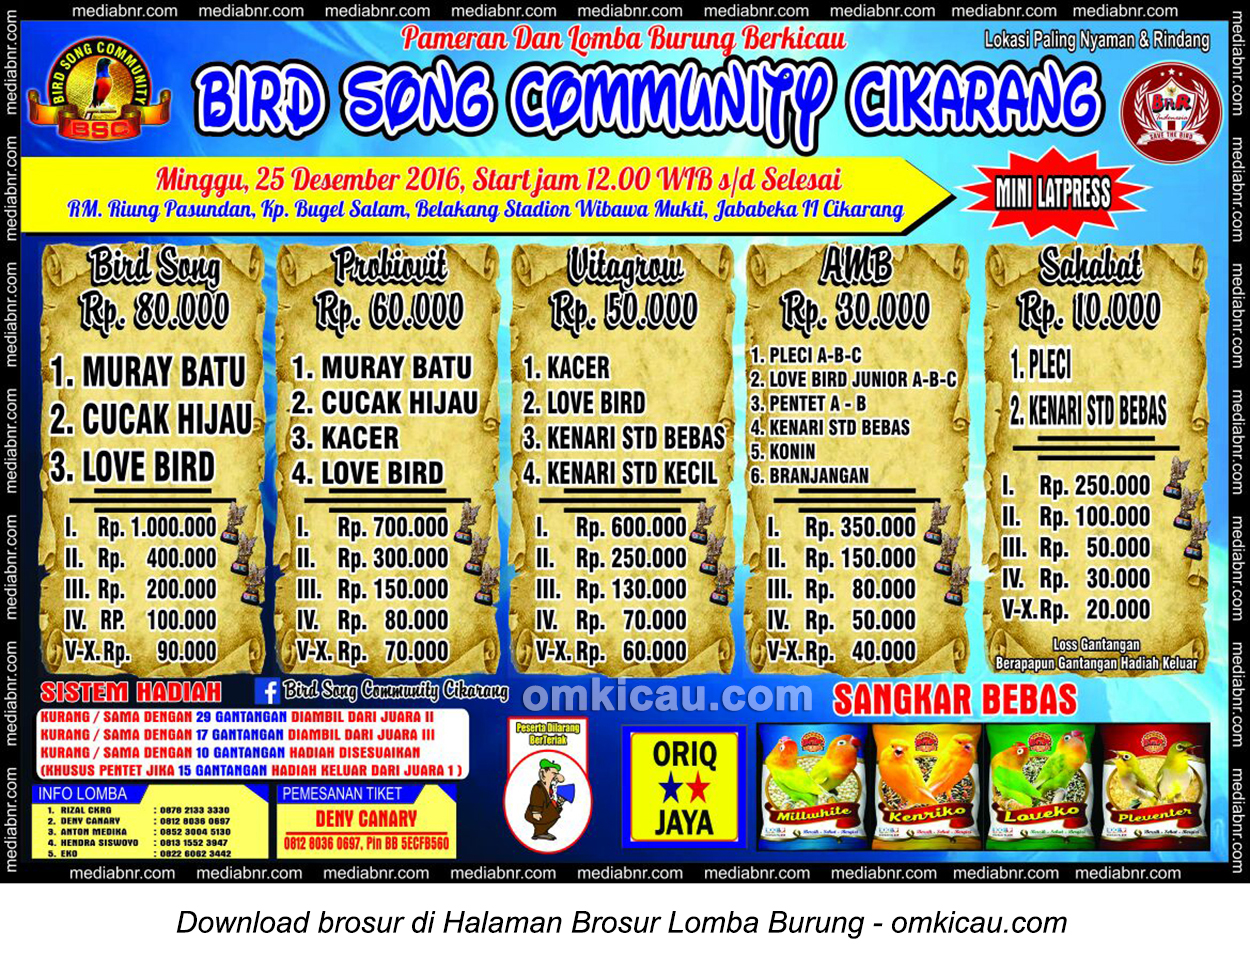 Brosur Mini Latpres Burung Berkicau Bird Song Community Cikarang, 25 Desember 2016